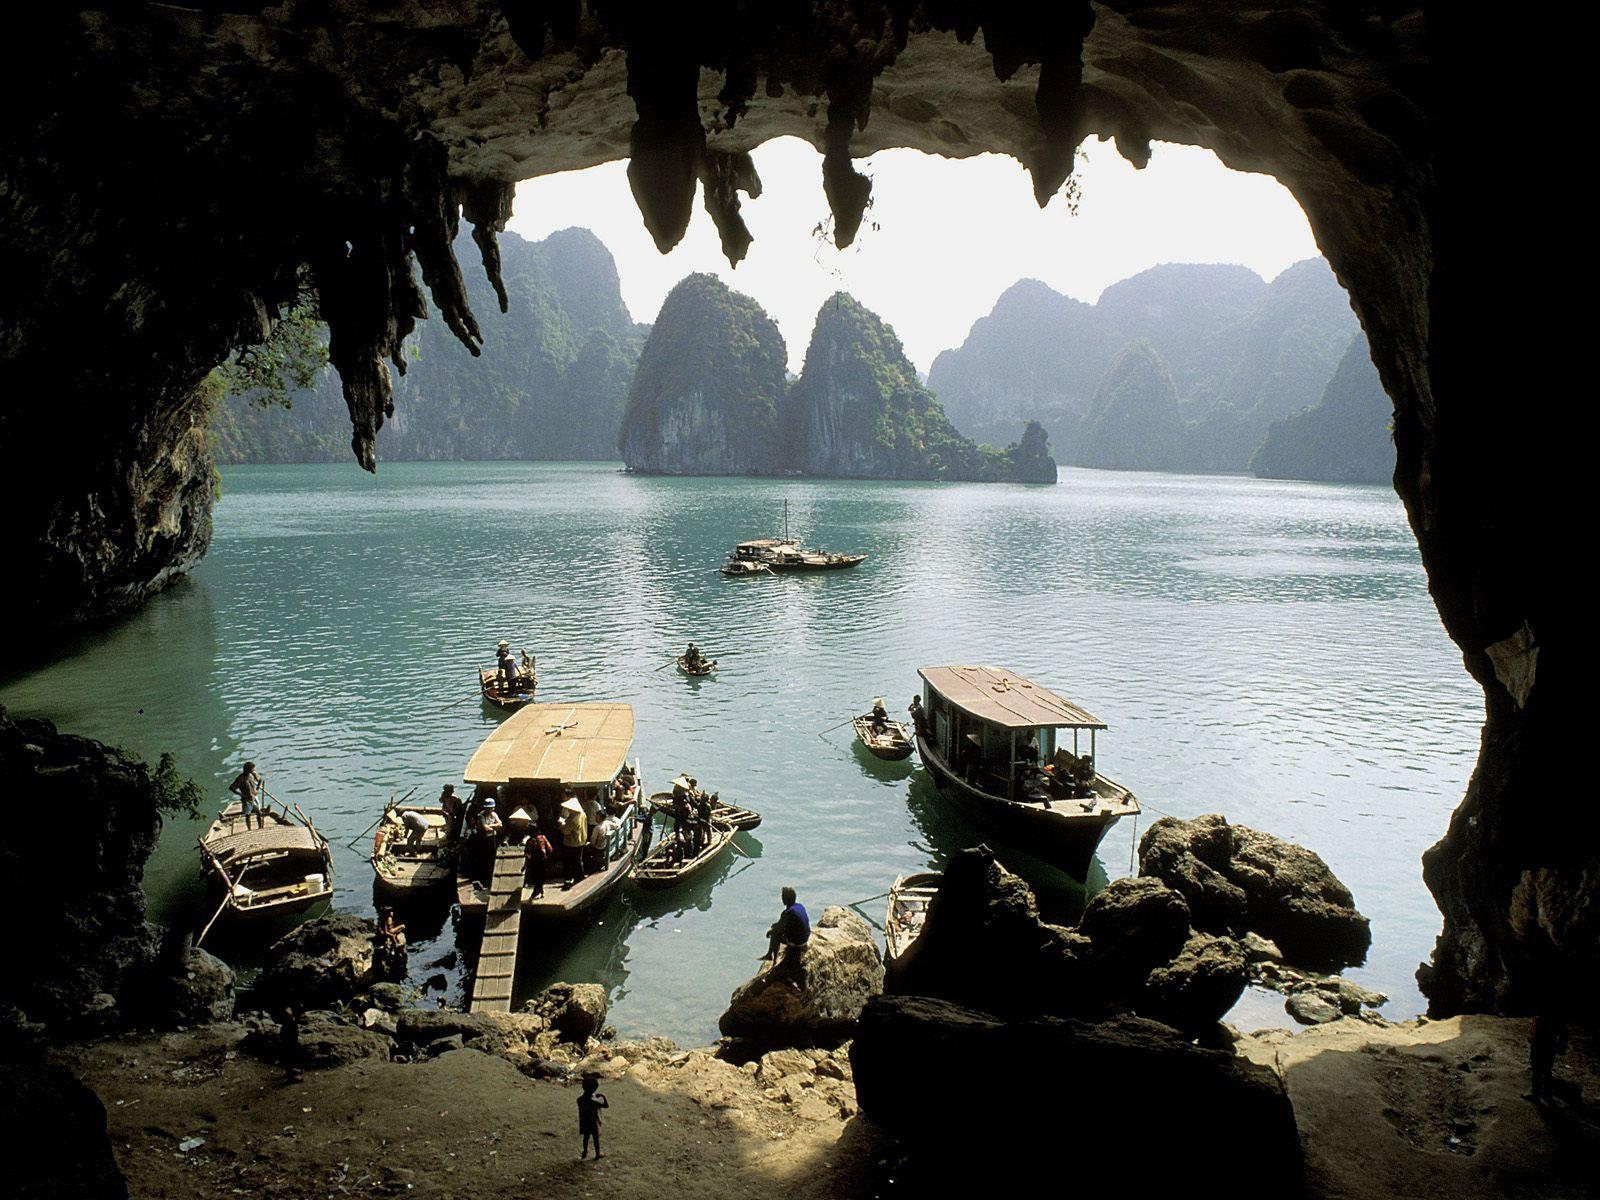 http://3.bp.blogspot.com/-EbWzJ_Qc7tY/TirkNBpIlaI/AAAAAAAAH84/C2XaulrGCpA/s1600/www.cbaw.co.cc+-+Asia+Best+Tourist+Place+To+Visit+HD+Wallpaper+%252827%2529.jpg